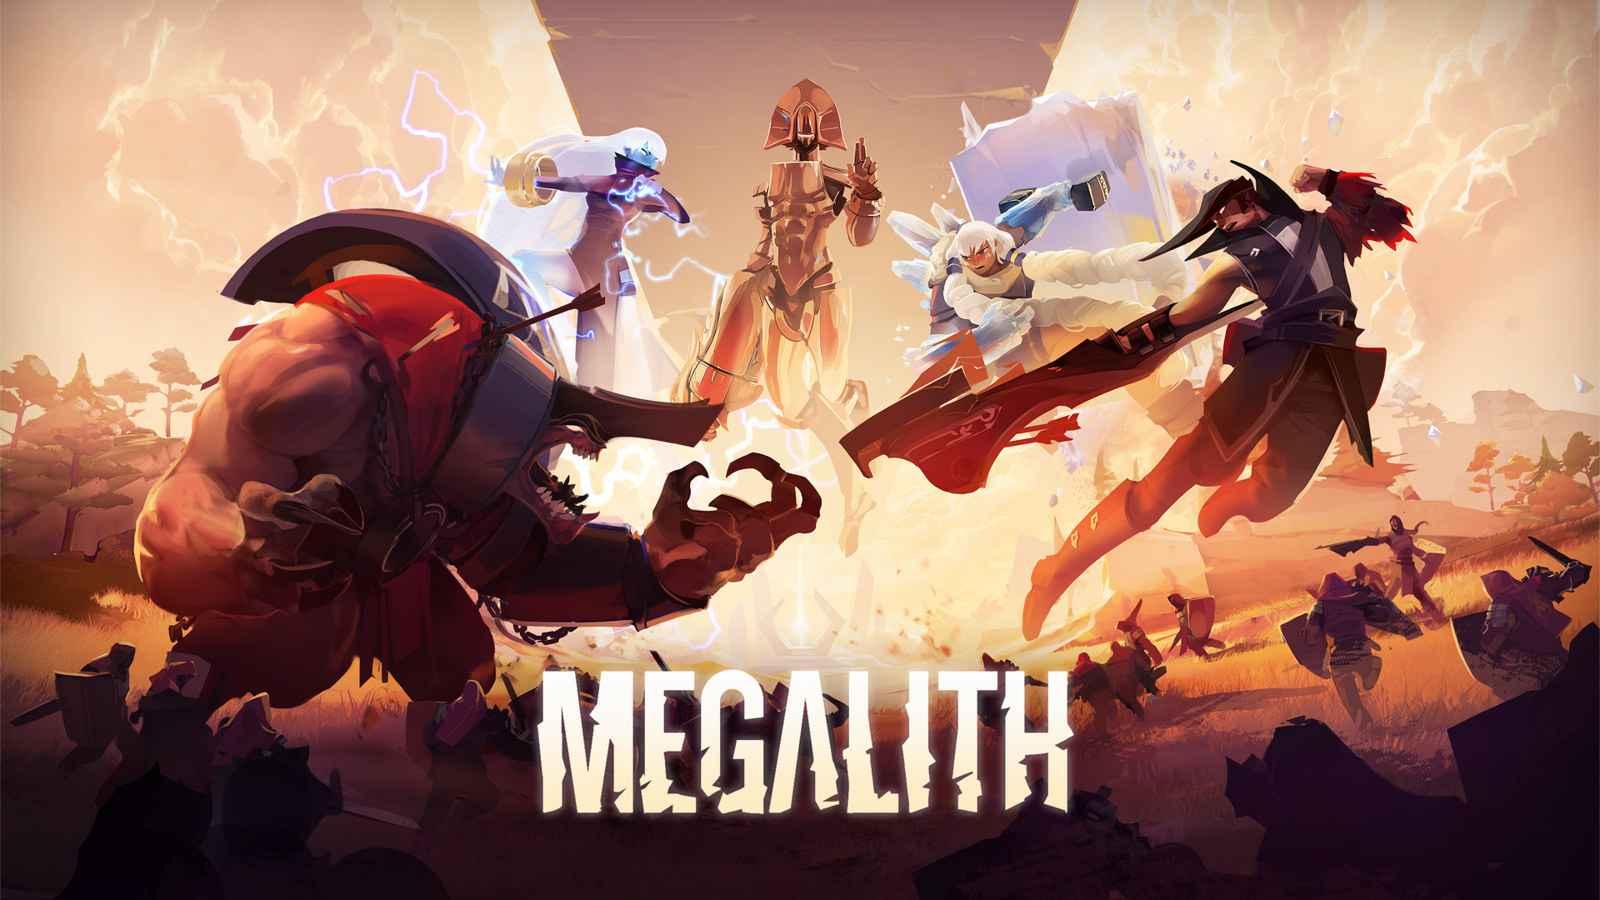 Megalith allows you to play as various Titans.